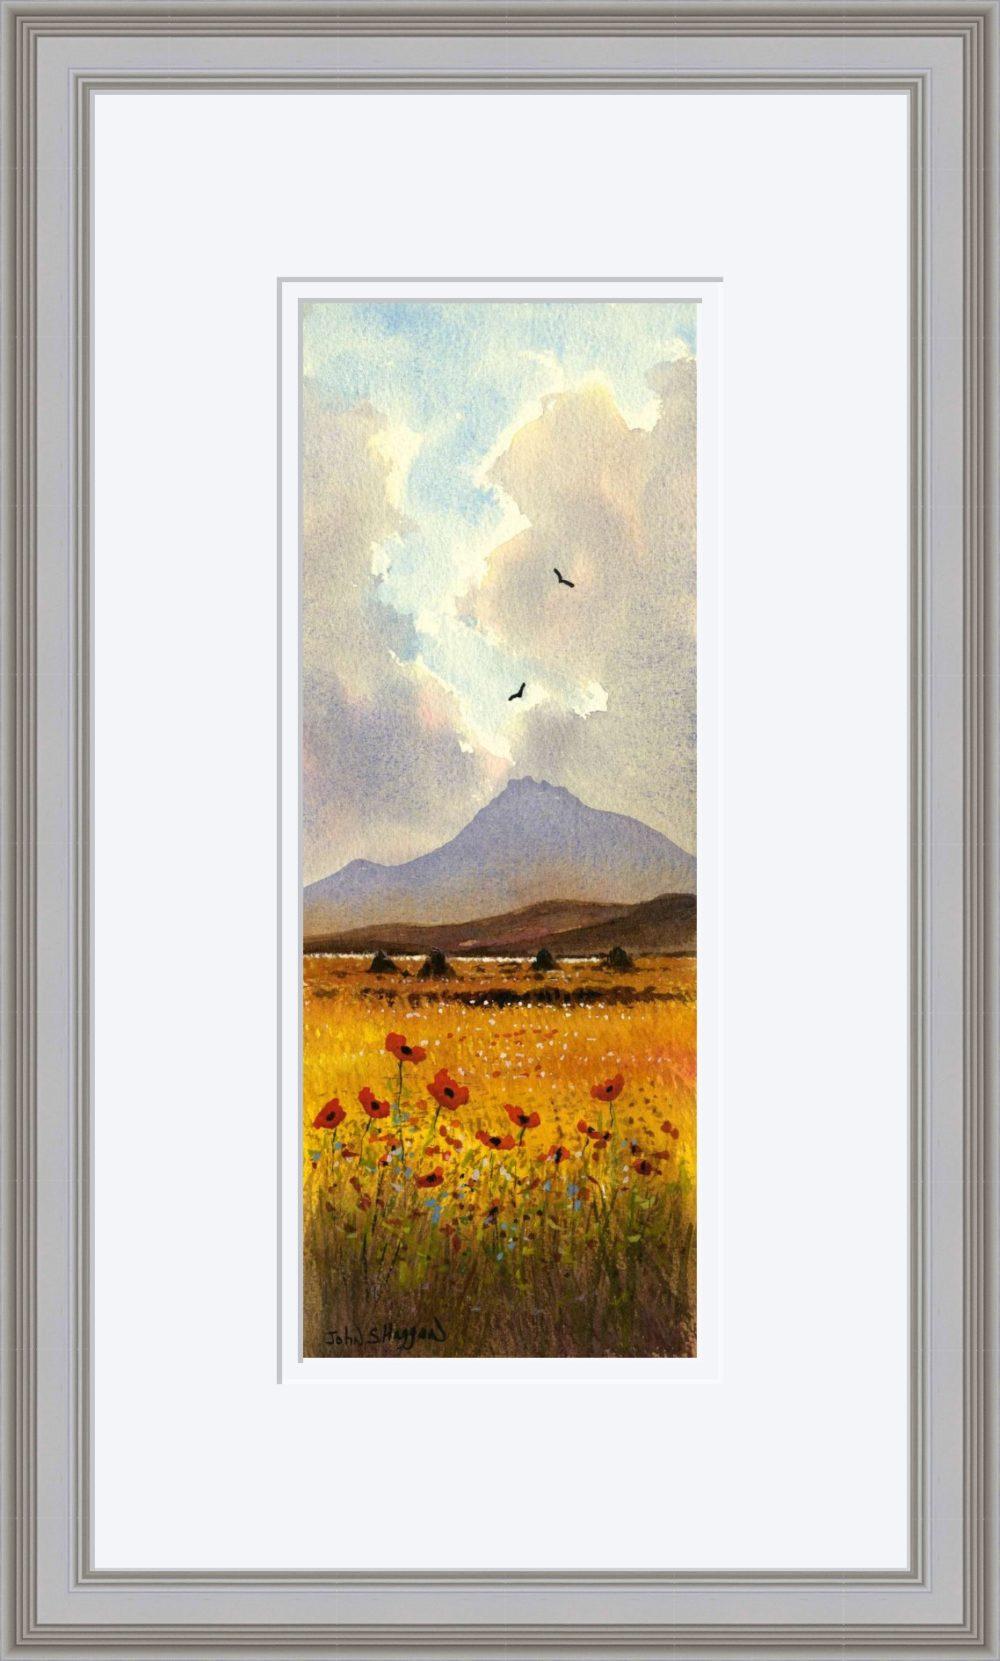 Connemara Poppies Print in Grey Frame